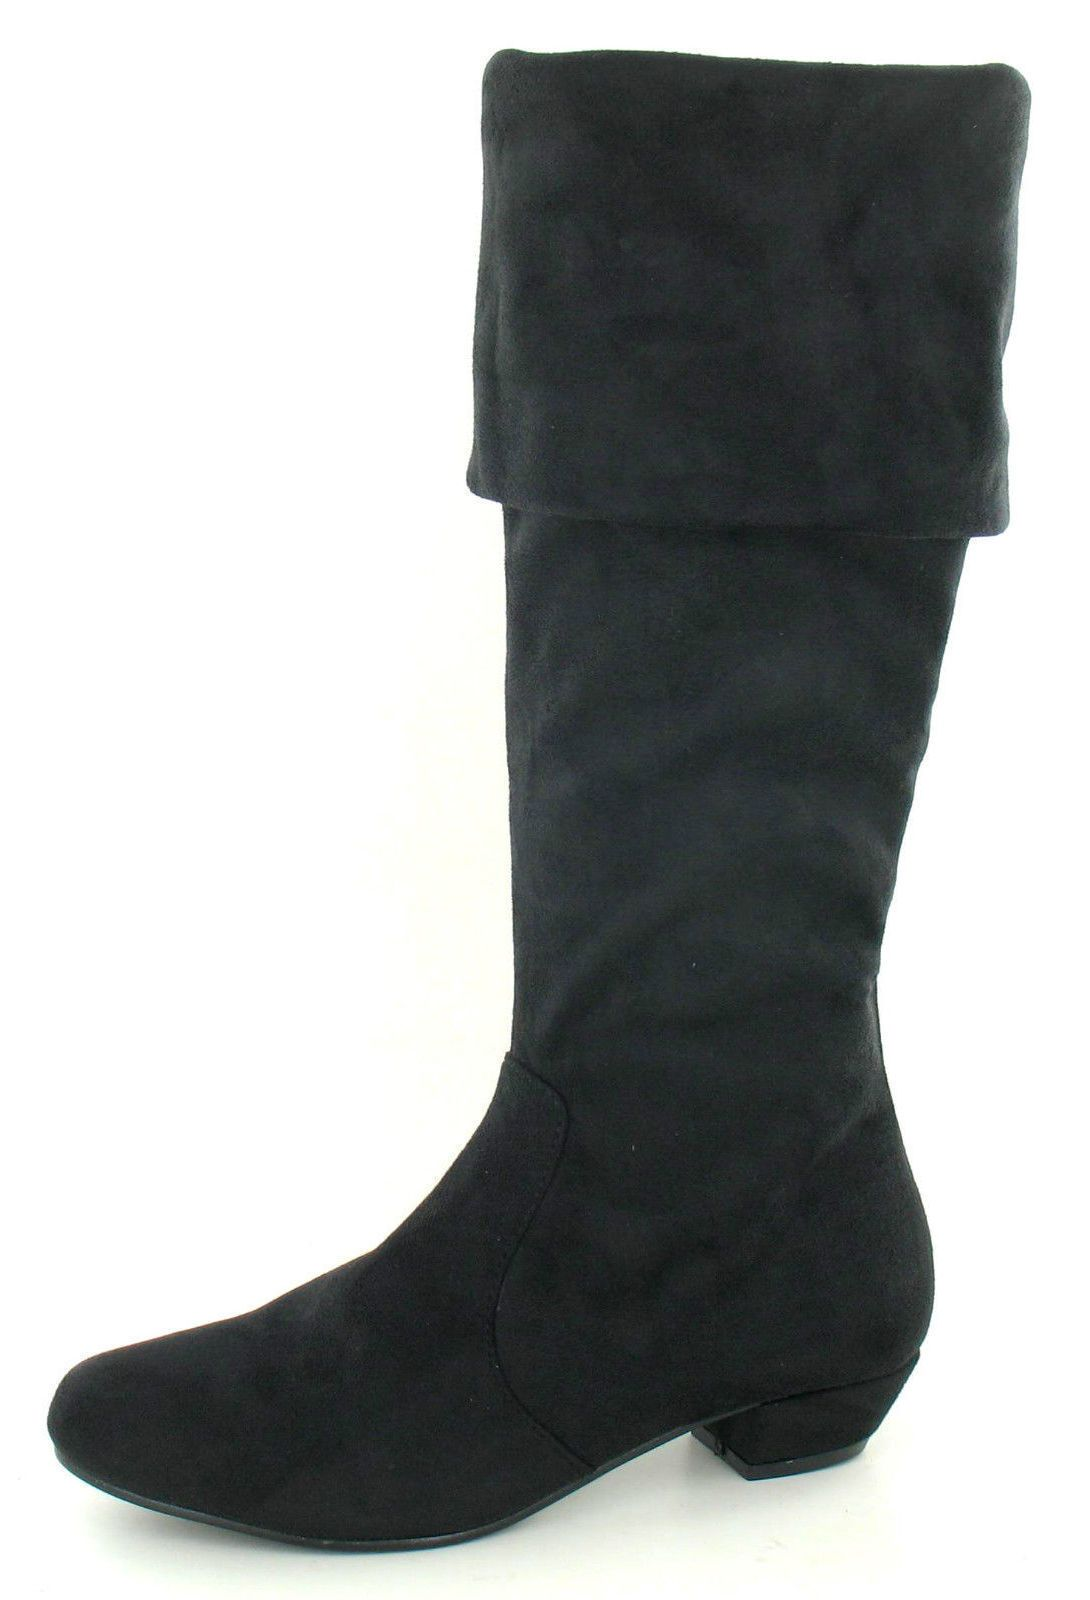 Sale Was 19.99 Now Ladies Spot On Textile Long Boots F50202